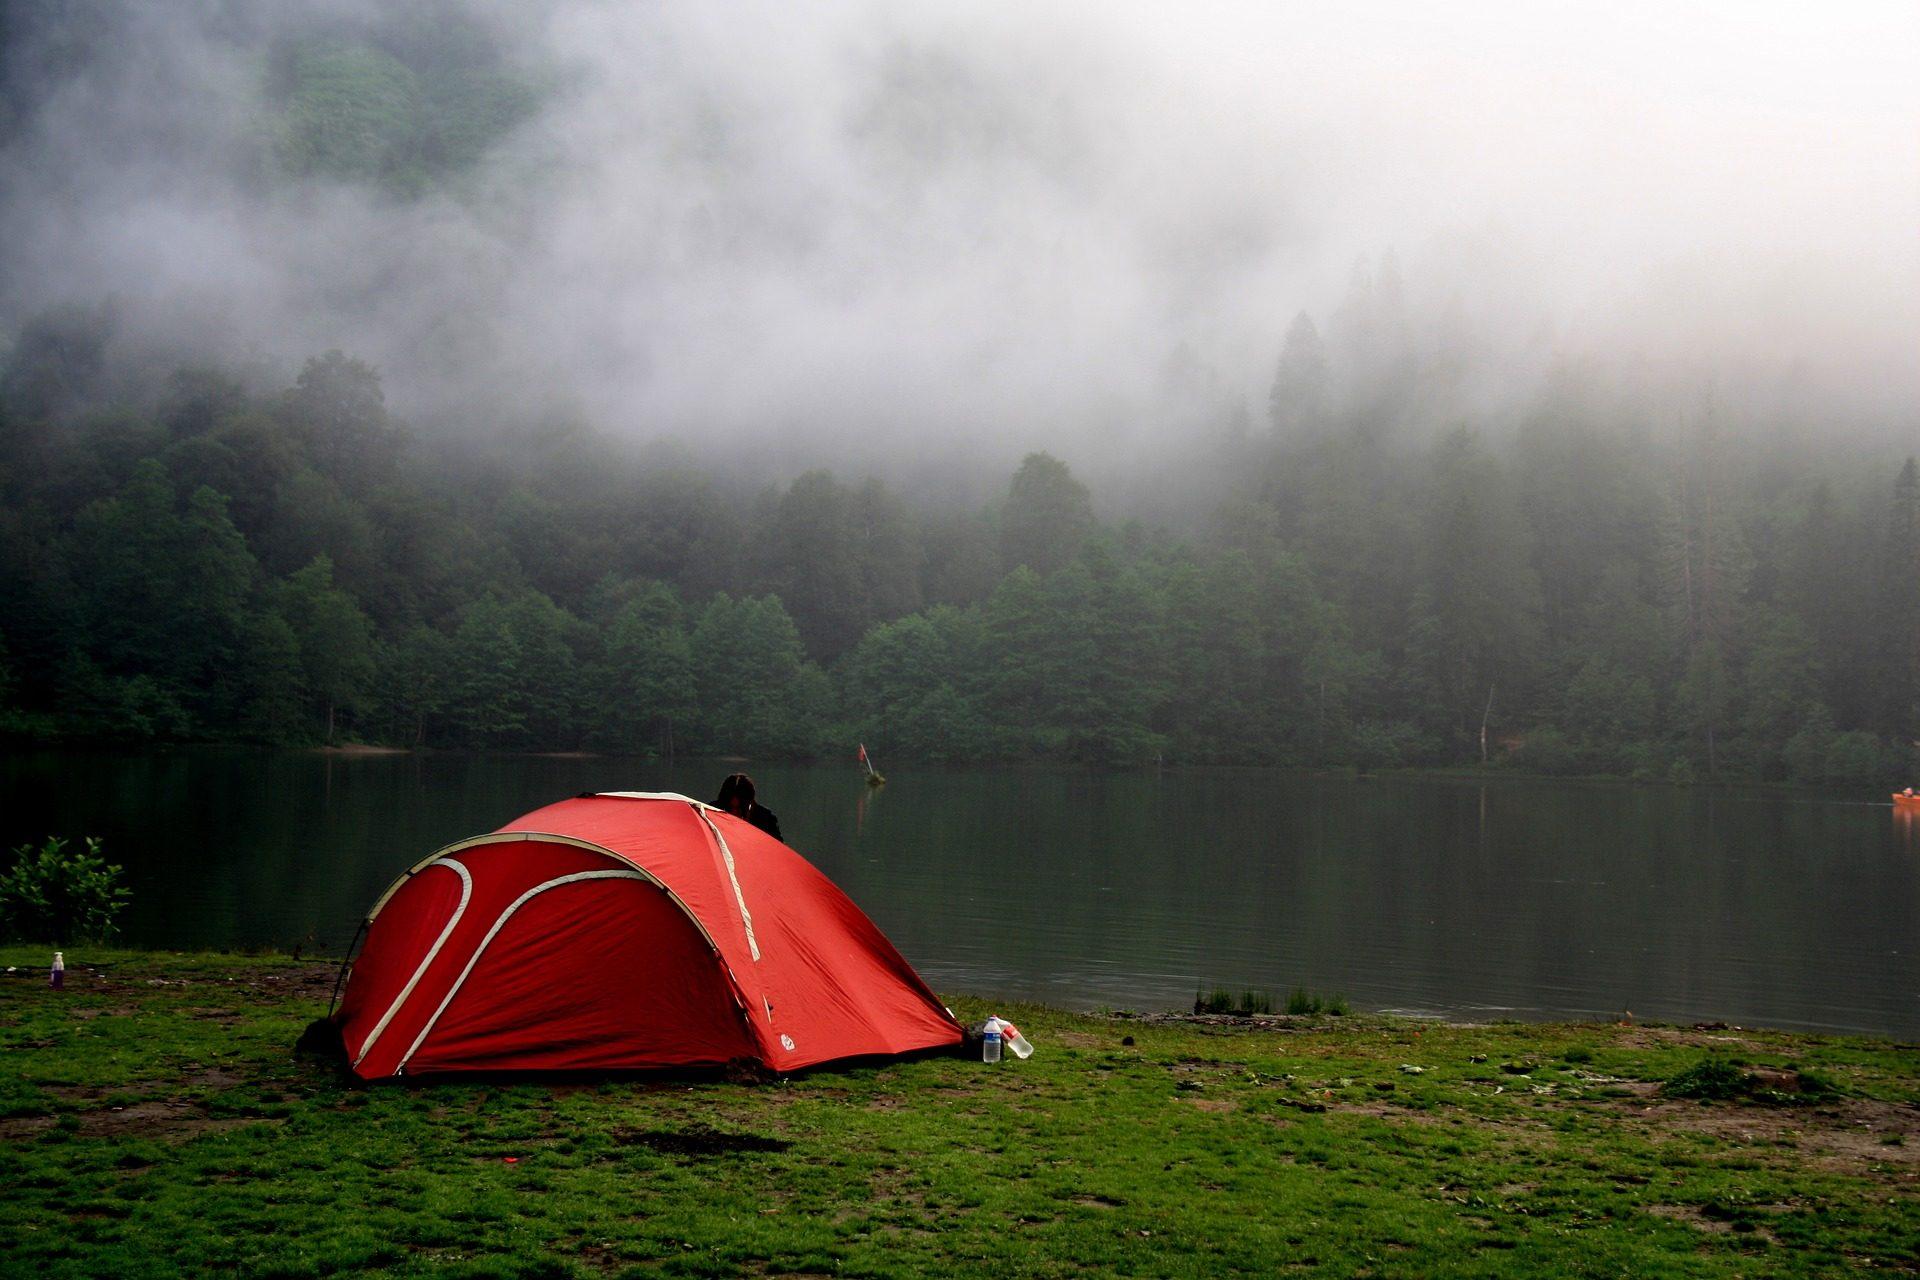 वन, फ़ील्ड, डेरा डाले हुए, झील, की दुकान - HD वॉलपेपर - प्रोफेसर-falken.com